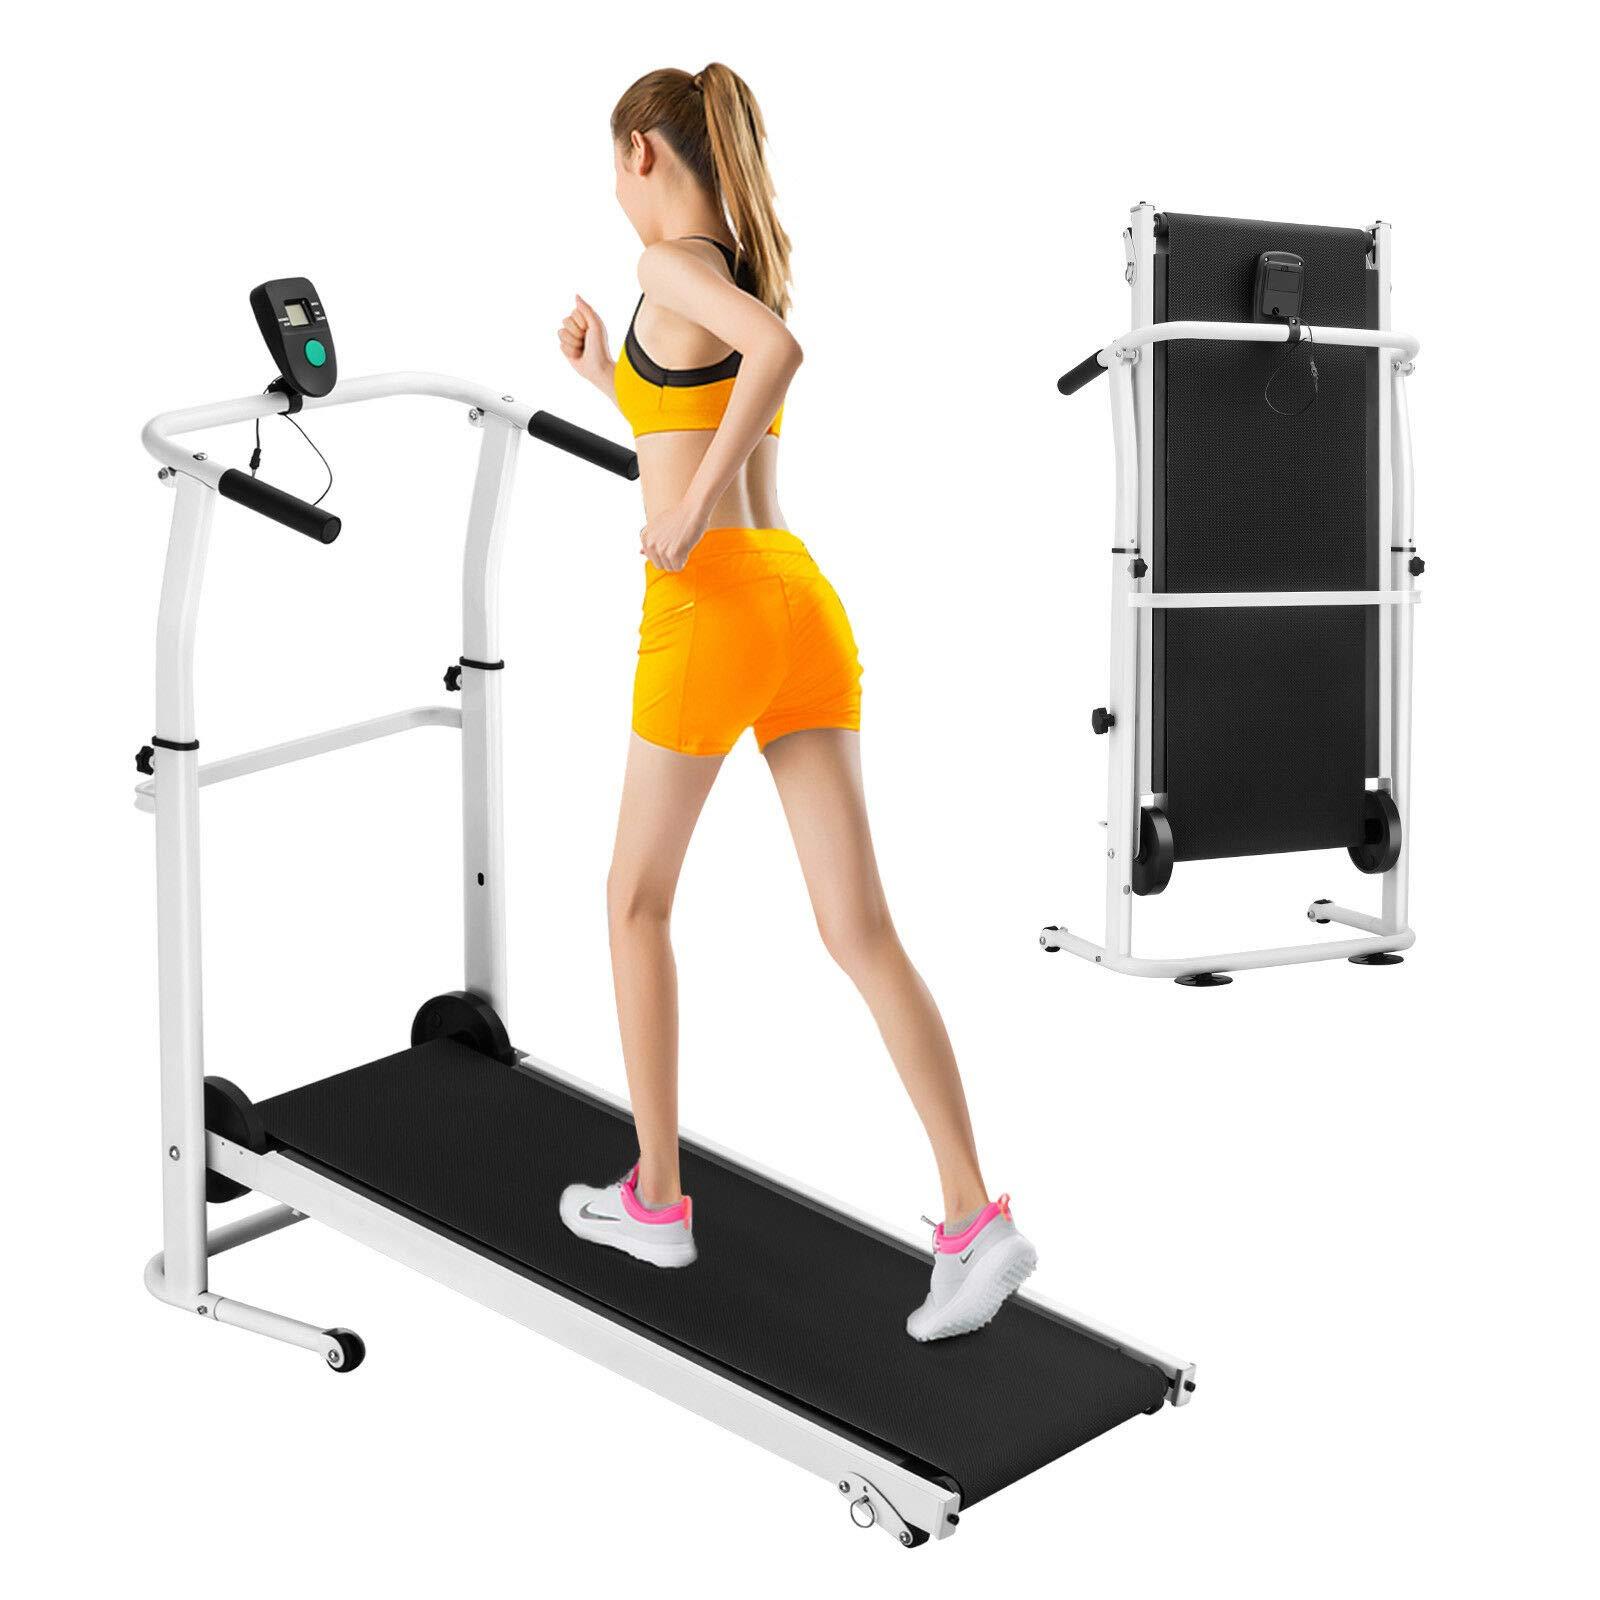 HappyShopShop Folding Adjustable Manual Treadmill Run Running Walk Walking Machine Cardio Exercise